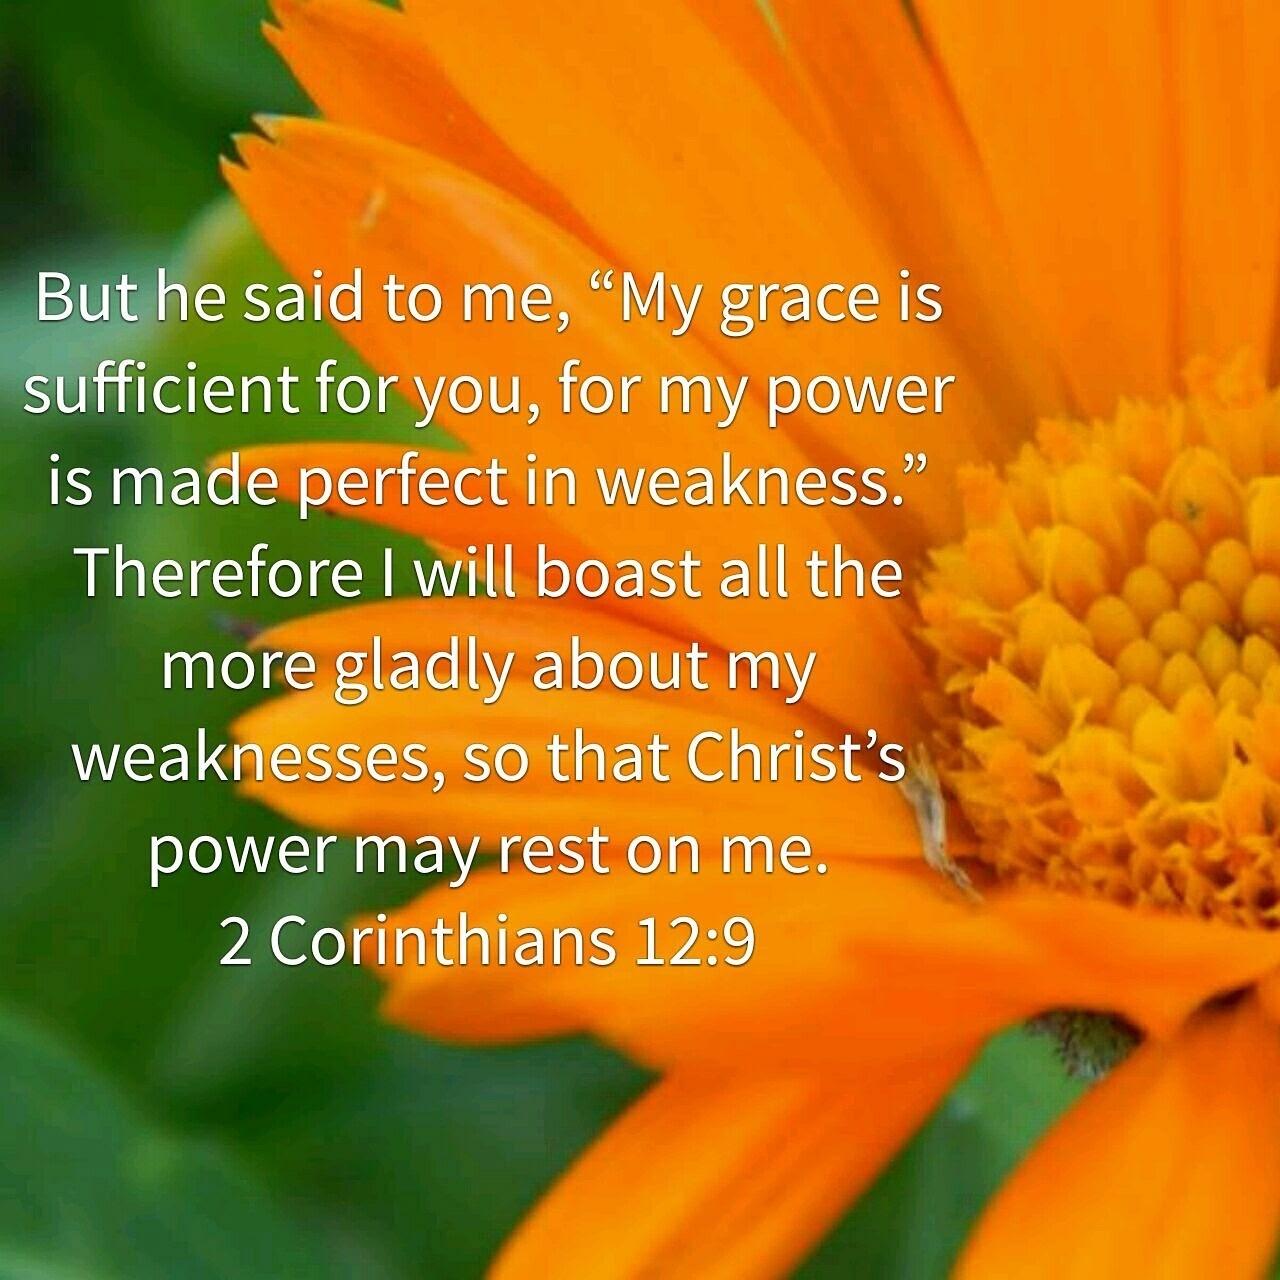 2 Corinthians 12:9 over large orange flower